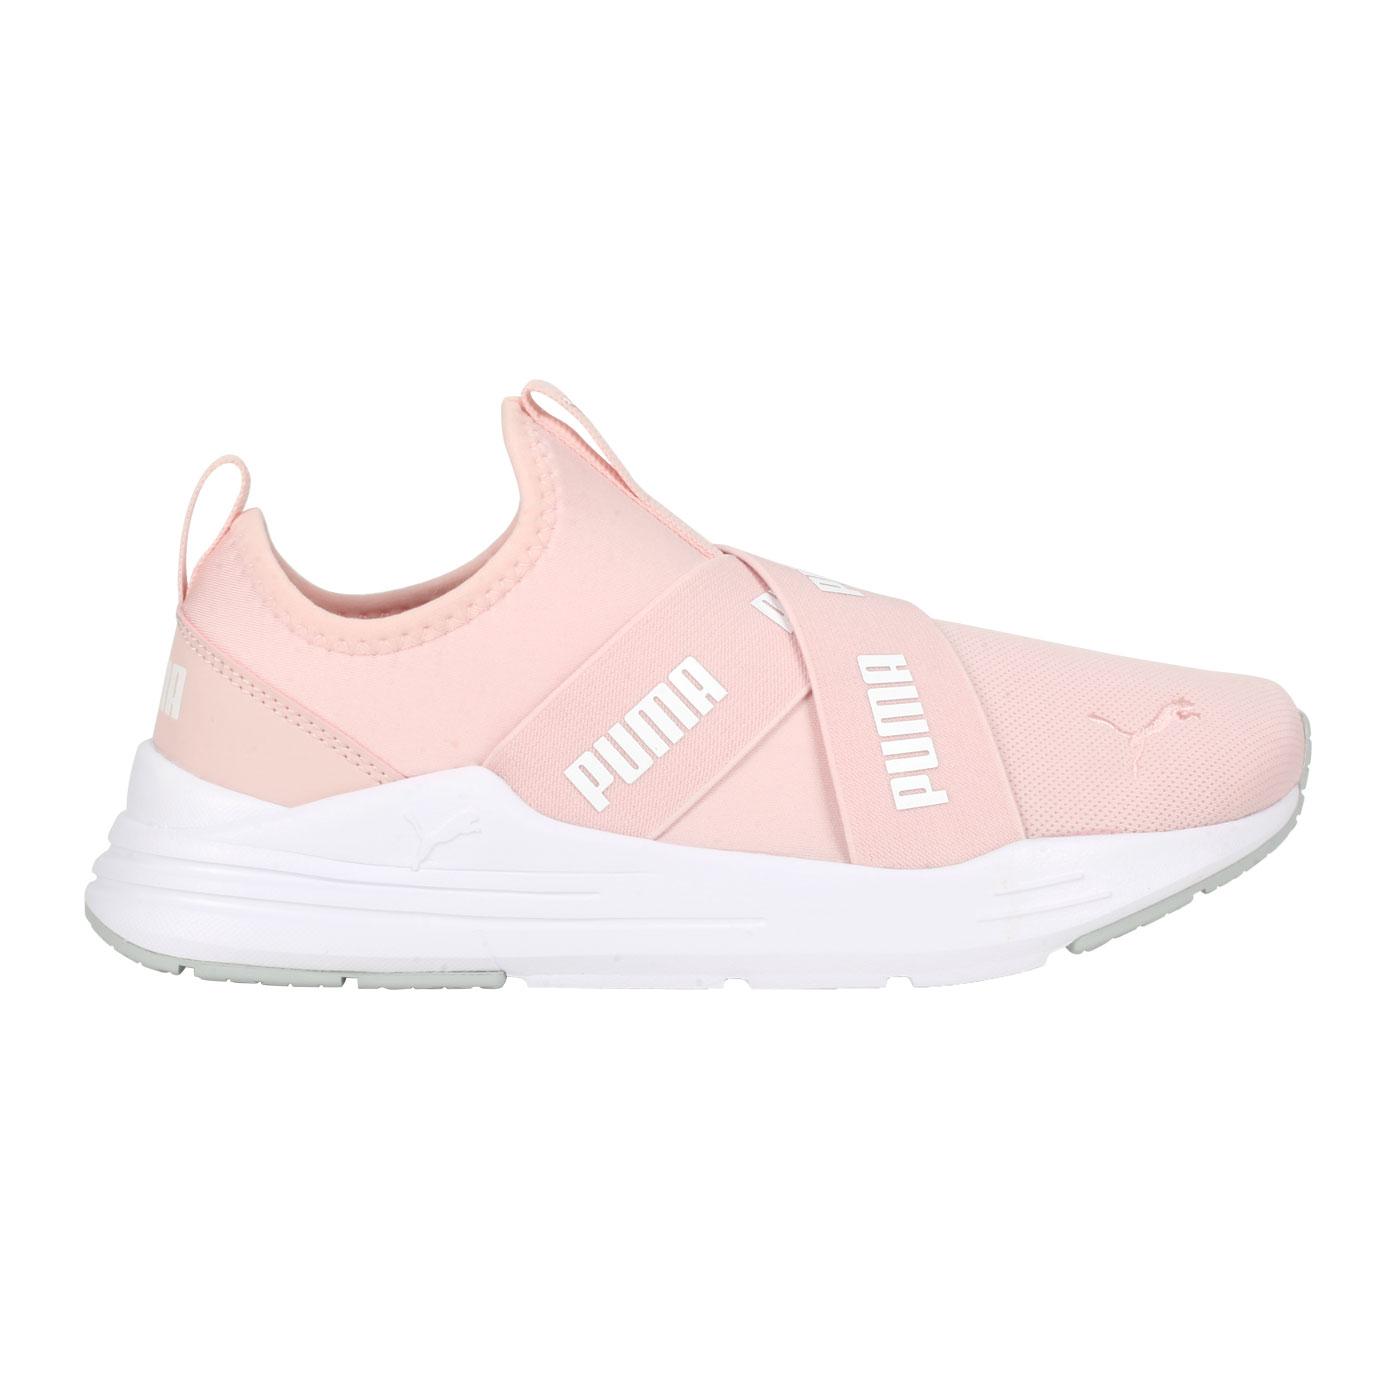 PUMA 女款休閒鞋  @Wired Run Slipon Wmns@38229903 - 粉紅白